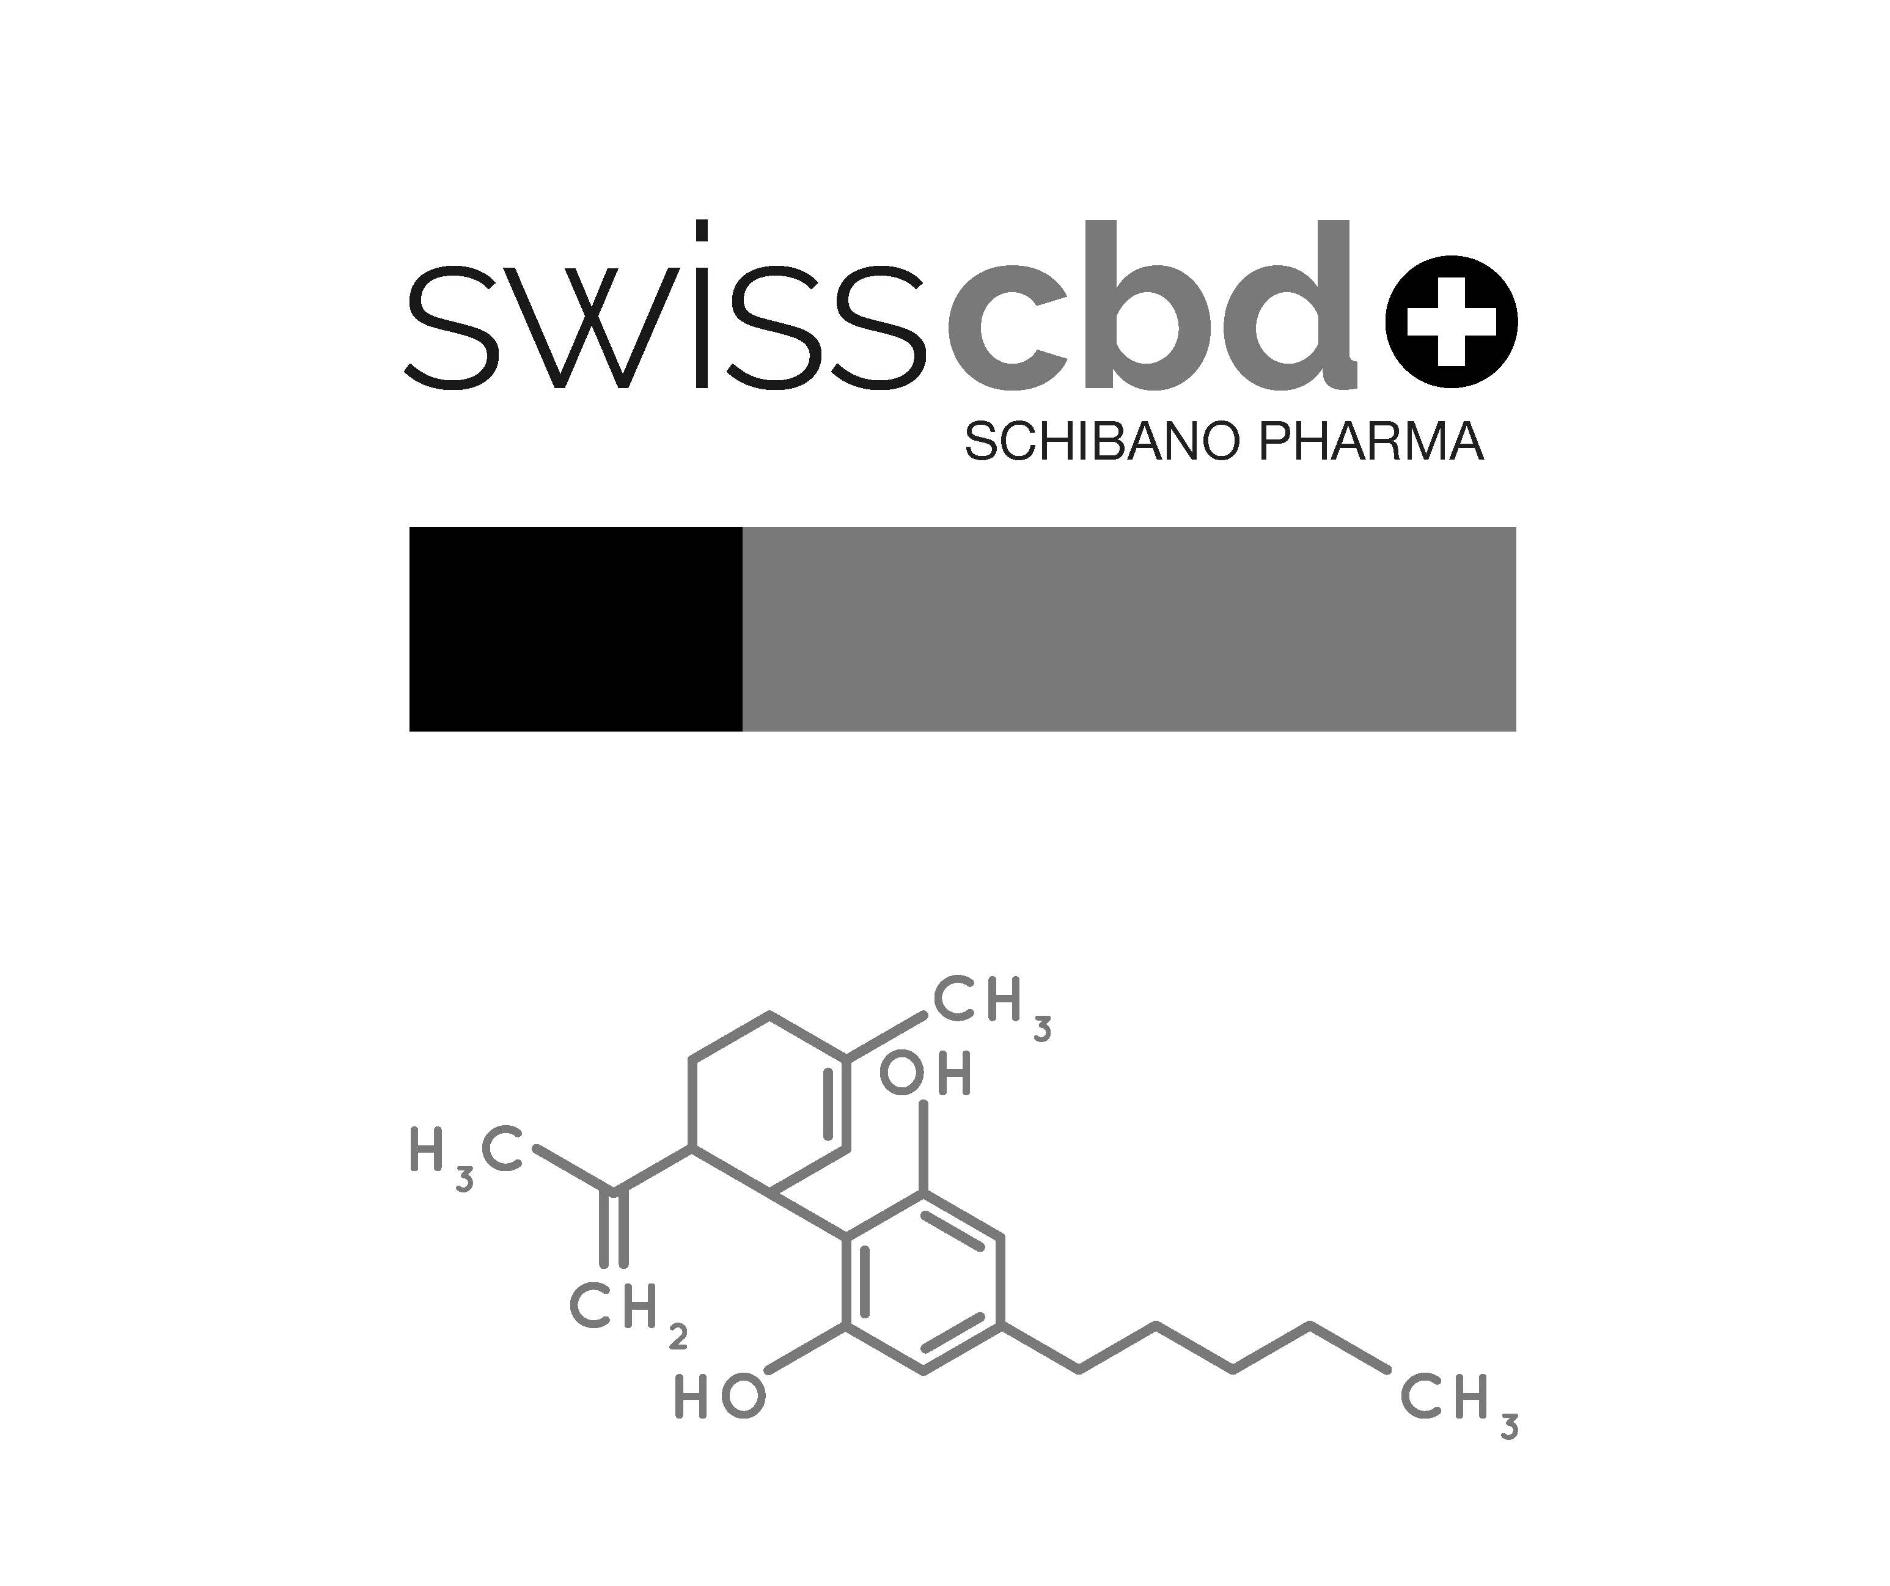 swisscbd schibano pharma